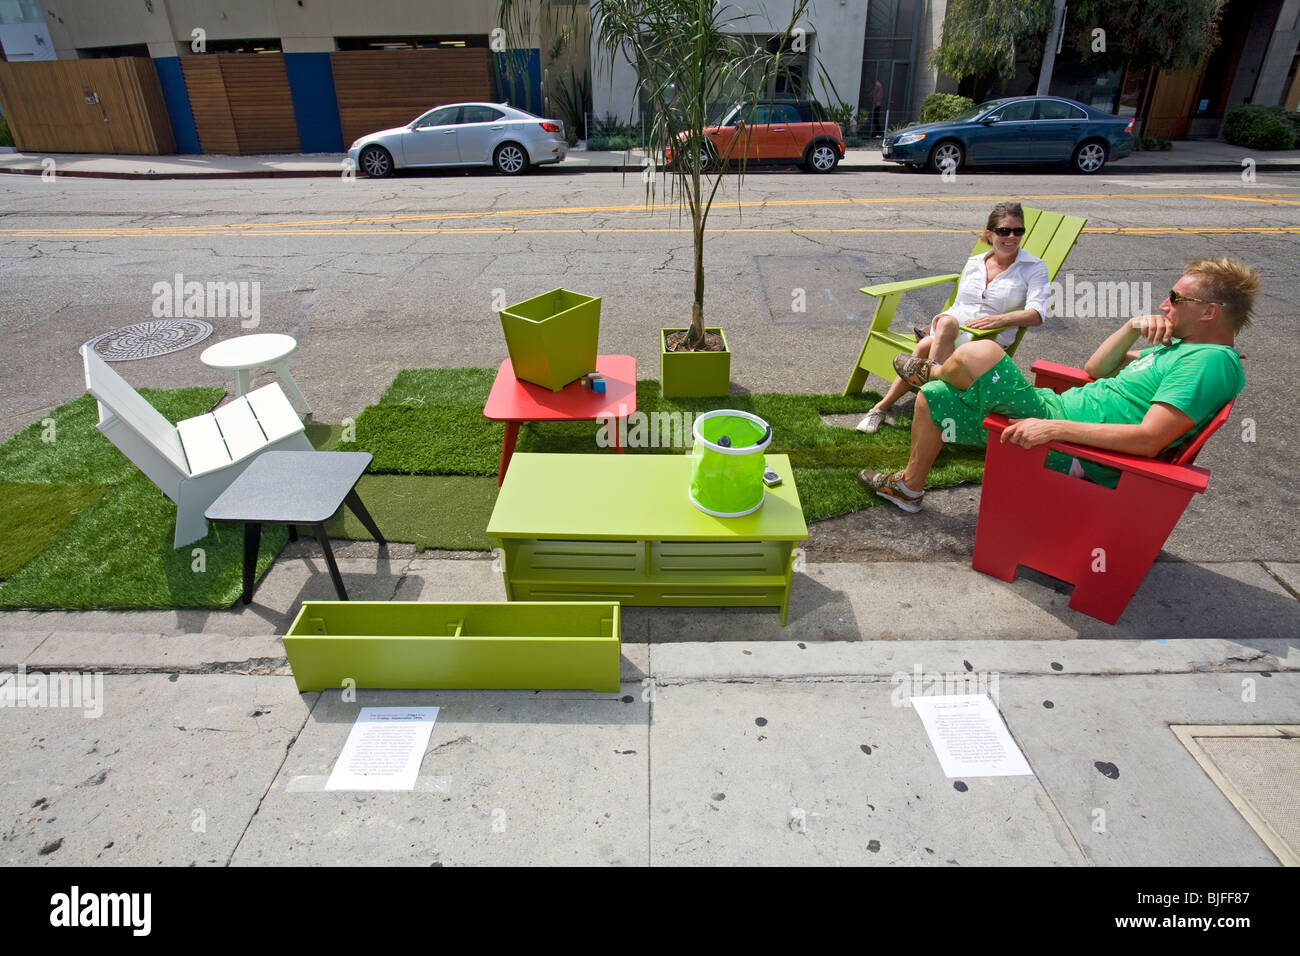 Third annual Park[ing] Day LA, Abbot Kinney Blvd, Venice, Los Angles, California - Stock Image